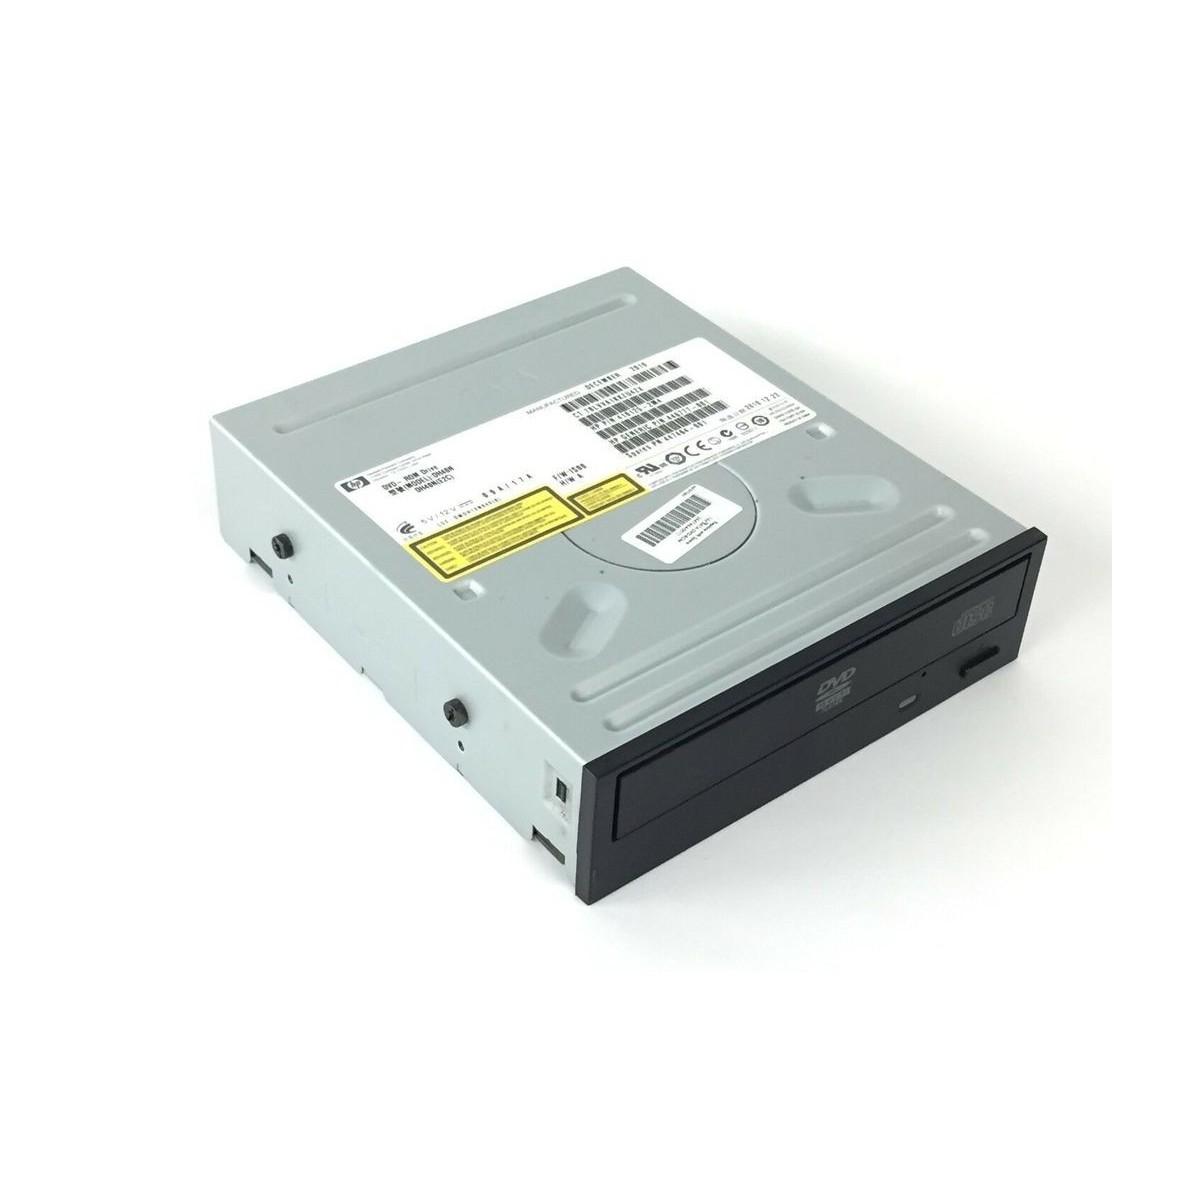 ZASILACZ 700W FUJITSU TX200 S5 S6 HP-D7001E0